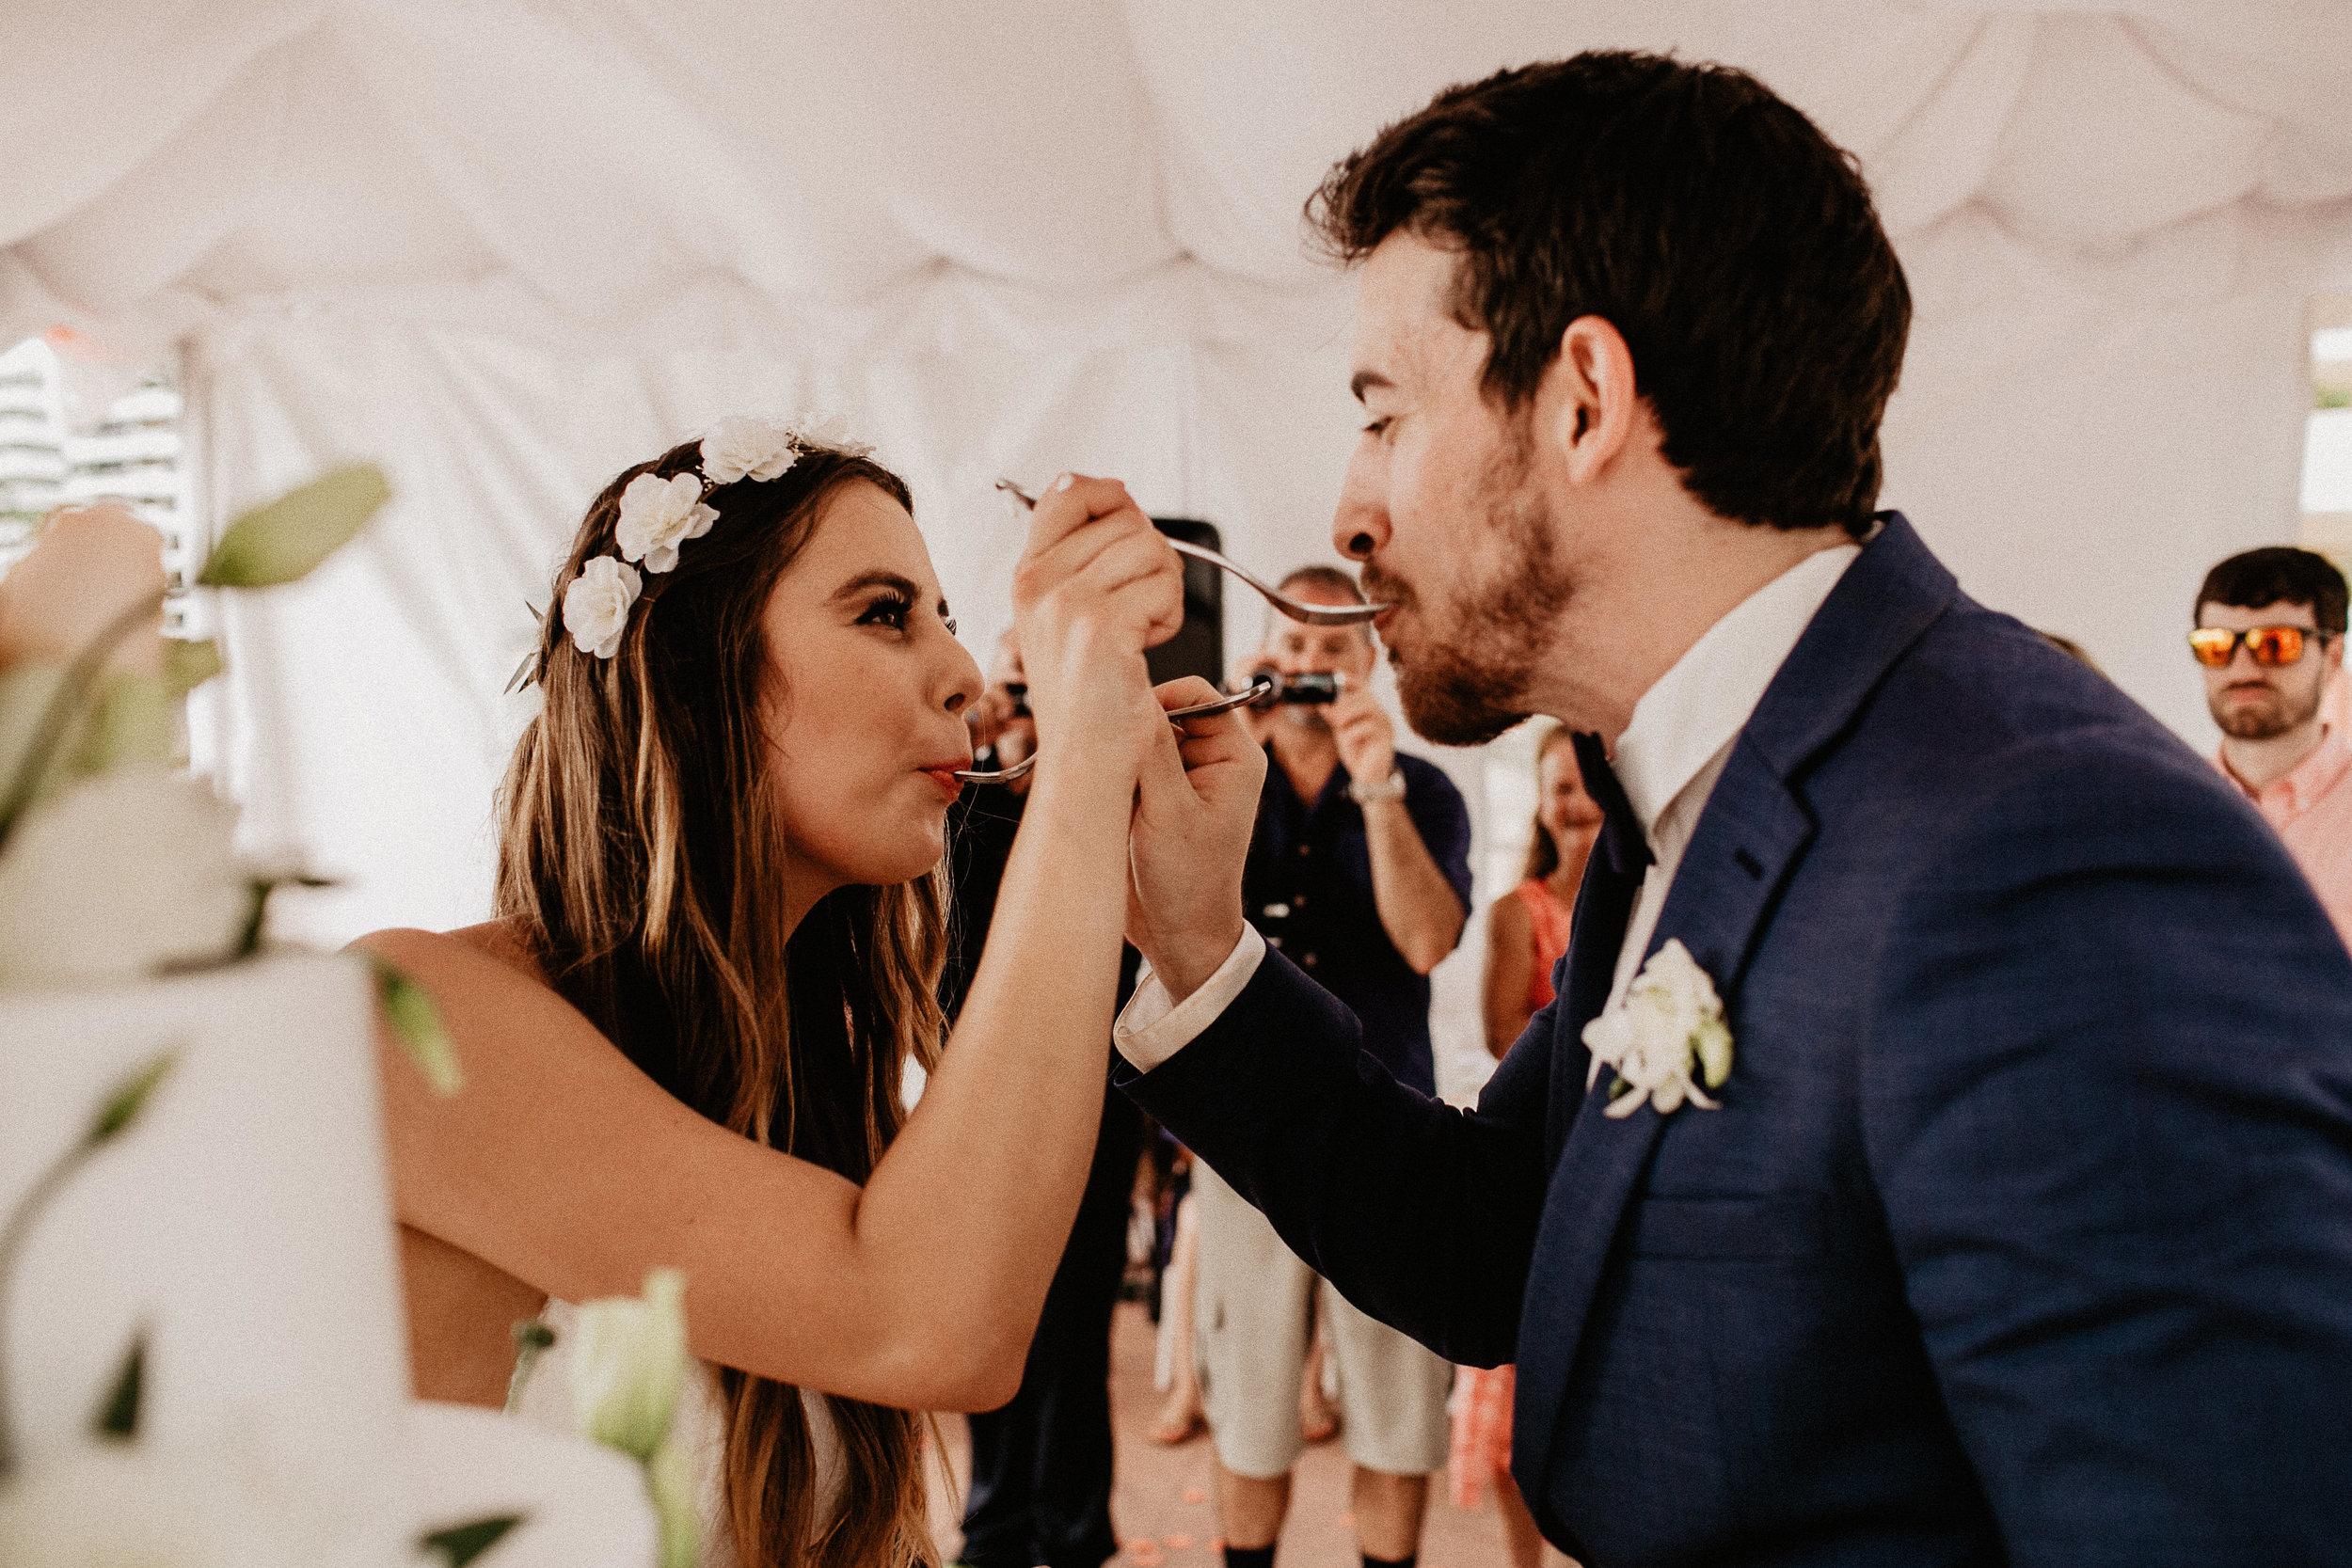 alfonso_flores_destination_wedding_photography_puerto_vallarta_hotel_barcelo_vallarta_cuttler_amela-567.JPG